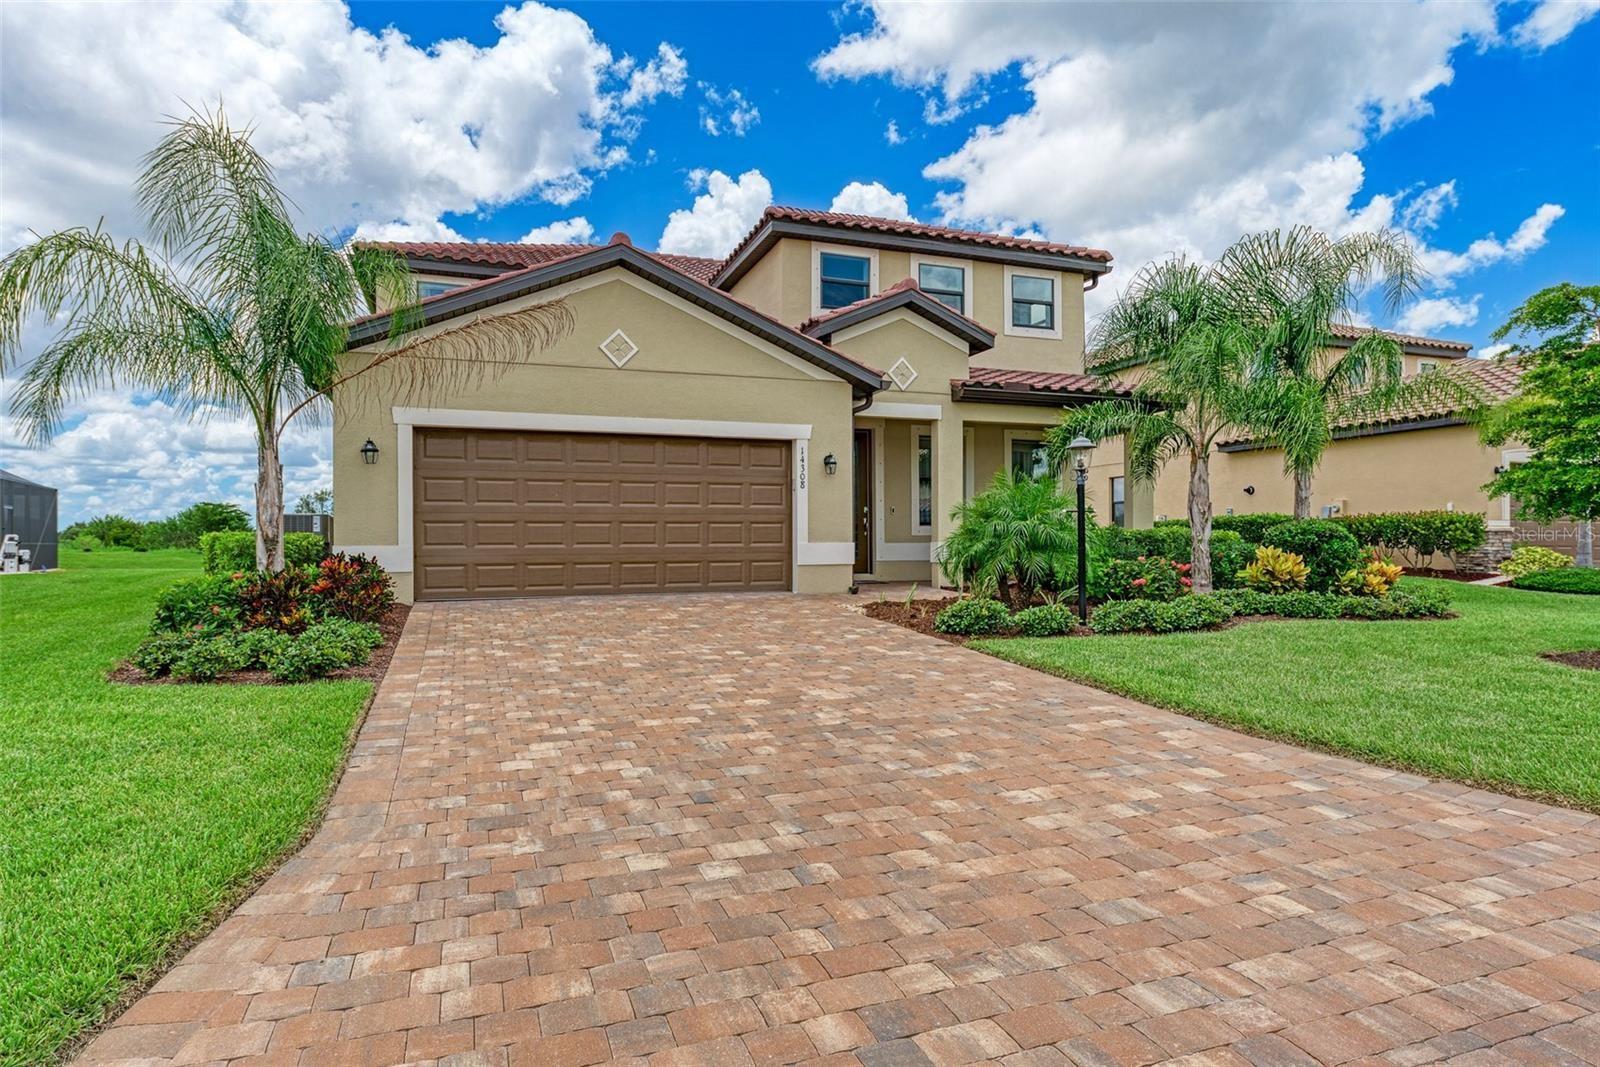 Photo of 14308 CAROLINA SKY PLACE, BRADENTON, FL 34211 (MLS # A4509435)